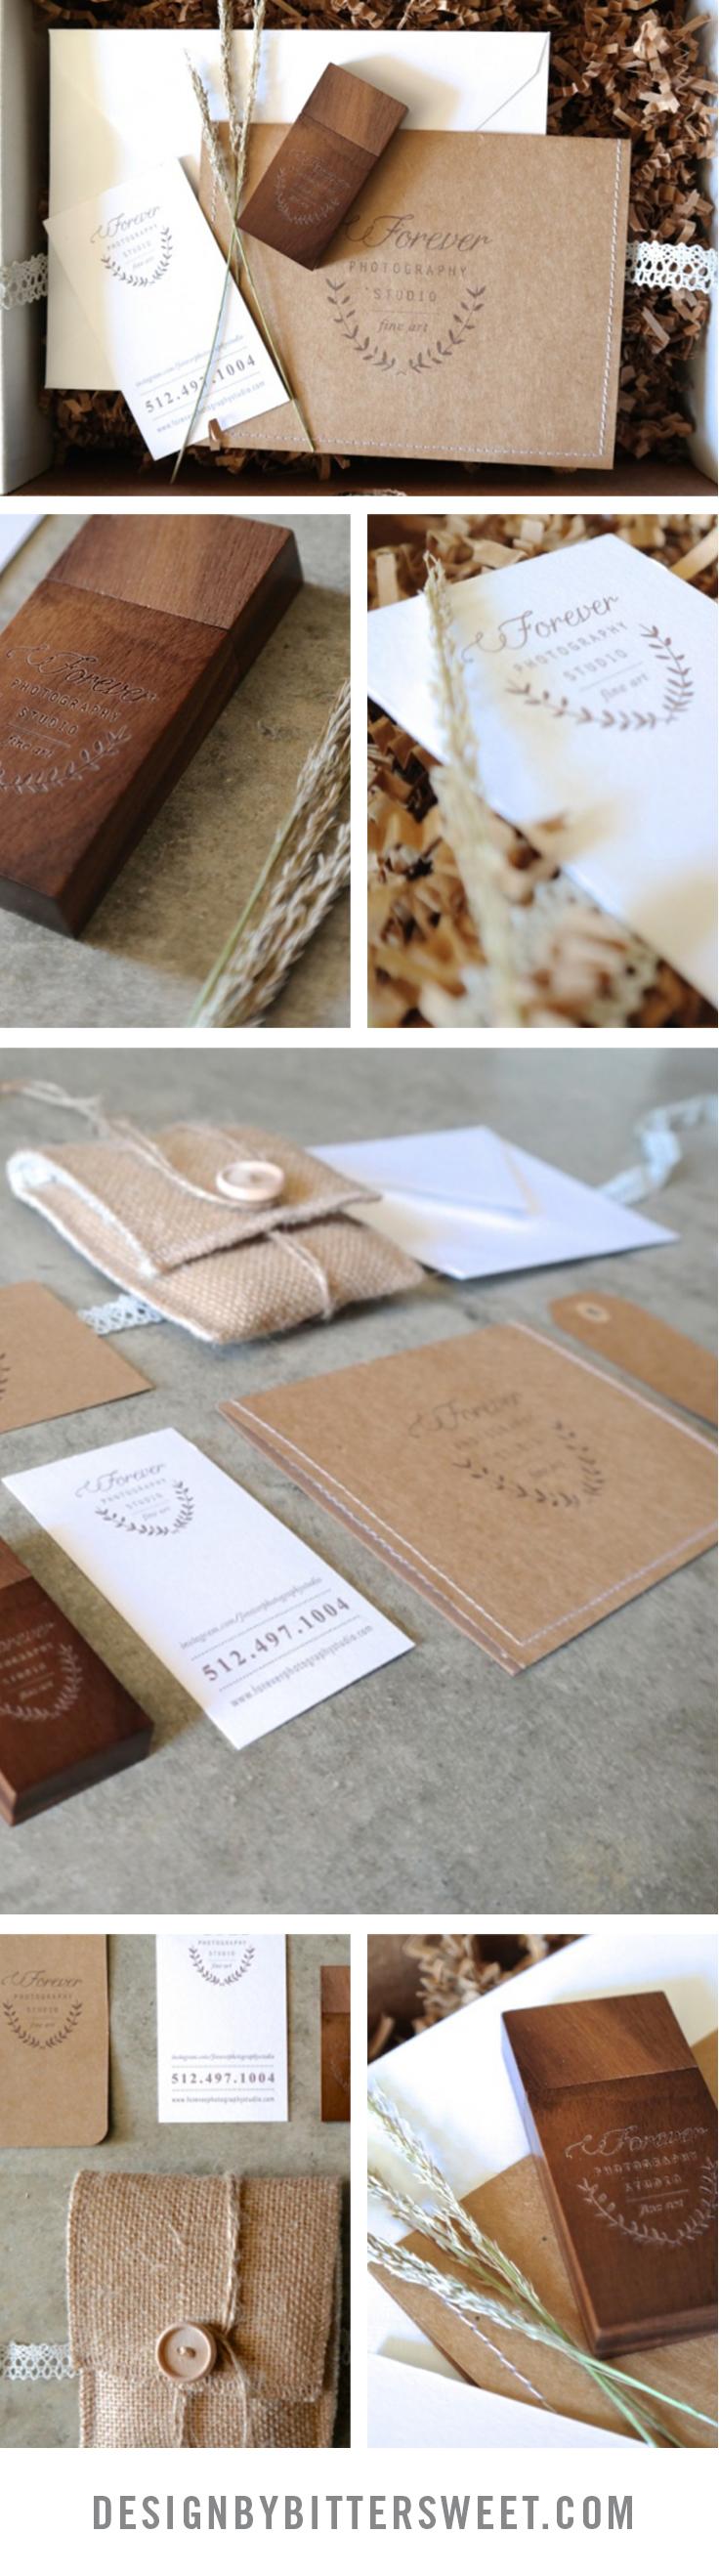 Boutique photographer packaging ideas.